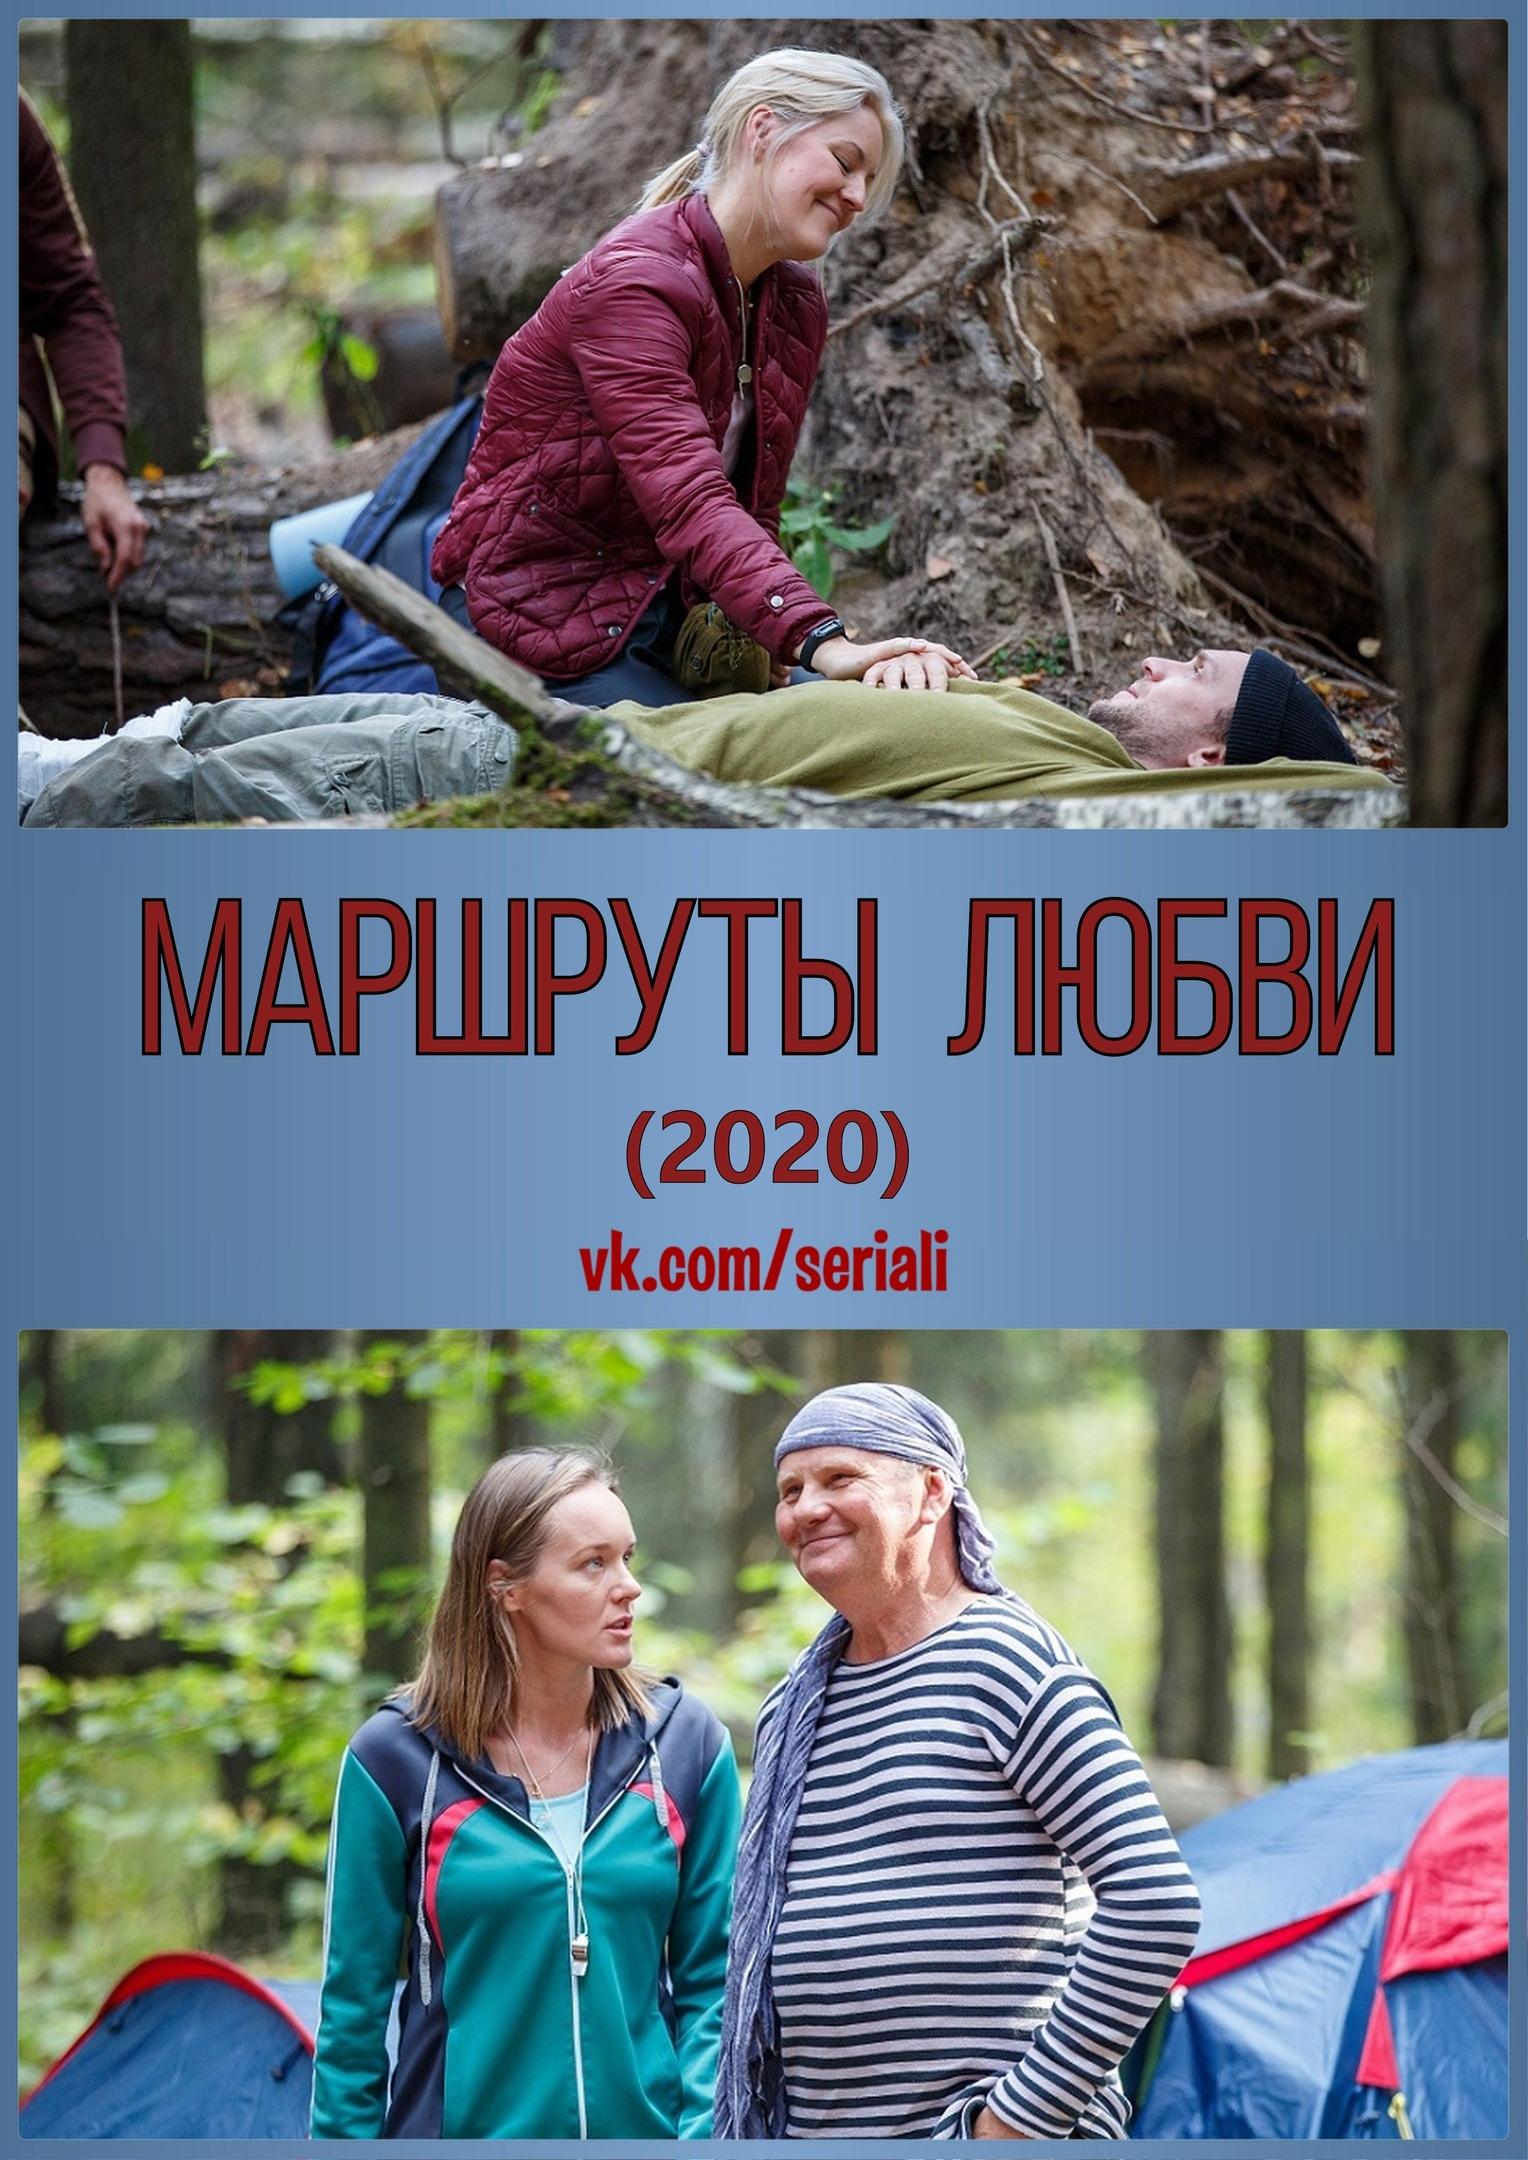 Мелодрама «Mapшpyты любви» (2020) 1-4 серия из 4 HD